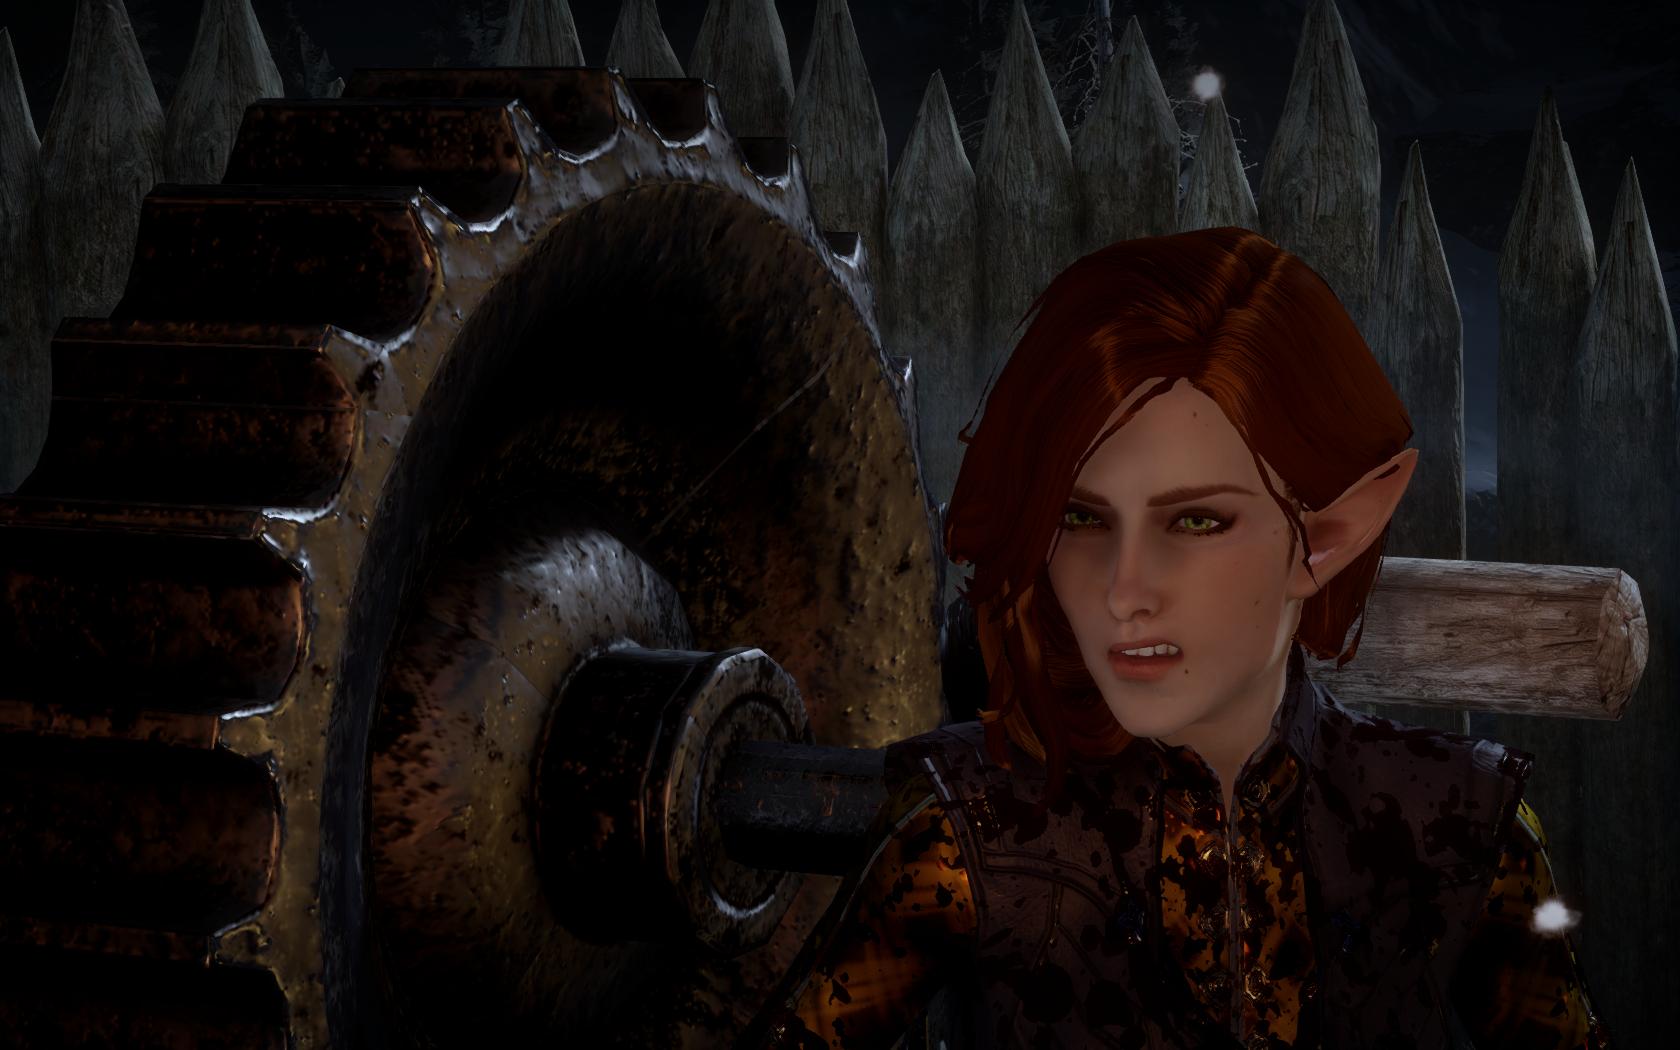 ScreenshotWin32_0117_Final.png - Dragon Age: Inquisition Персонаж